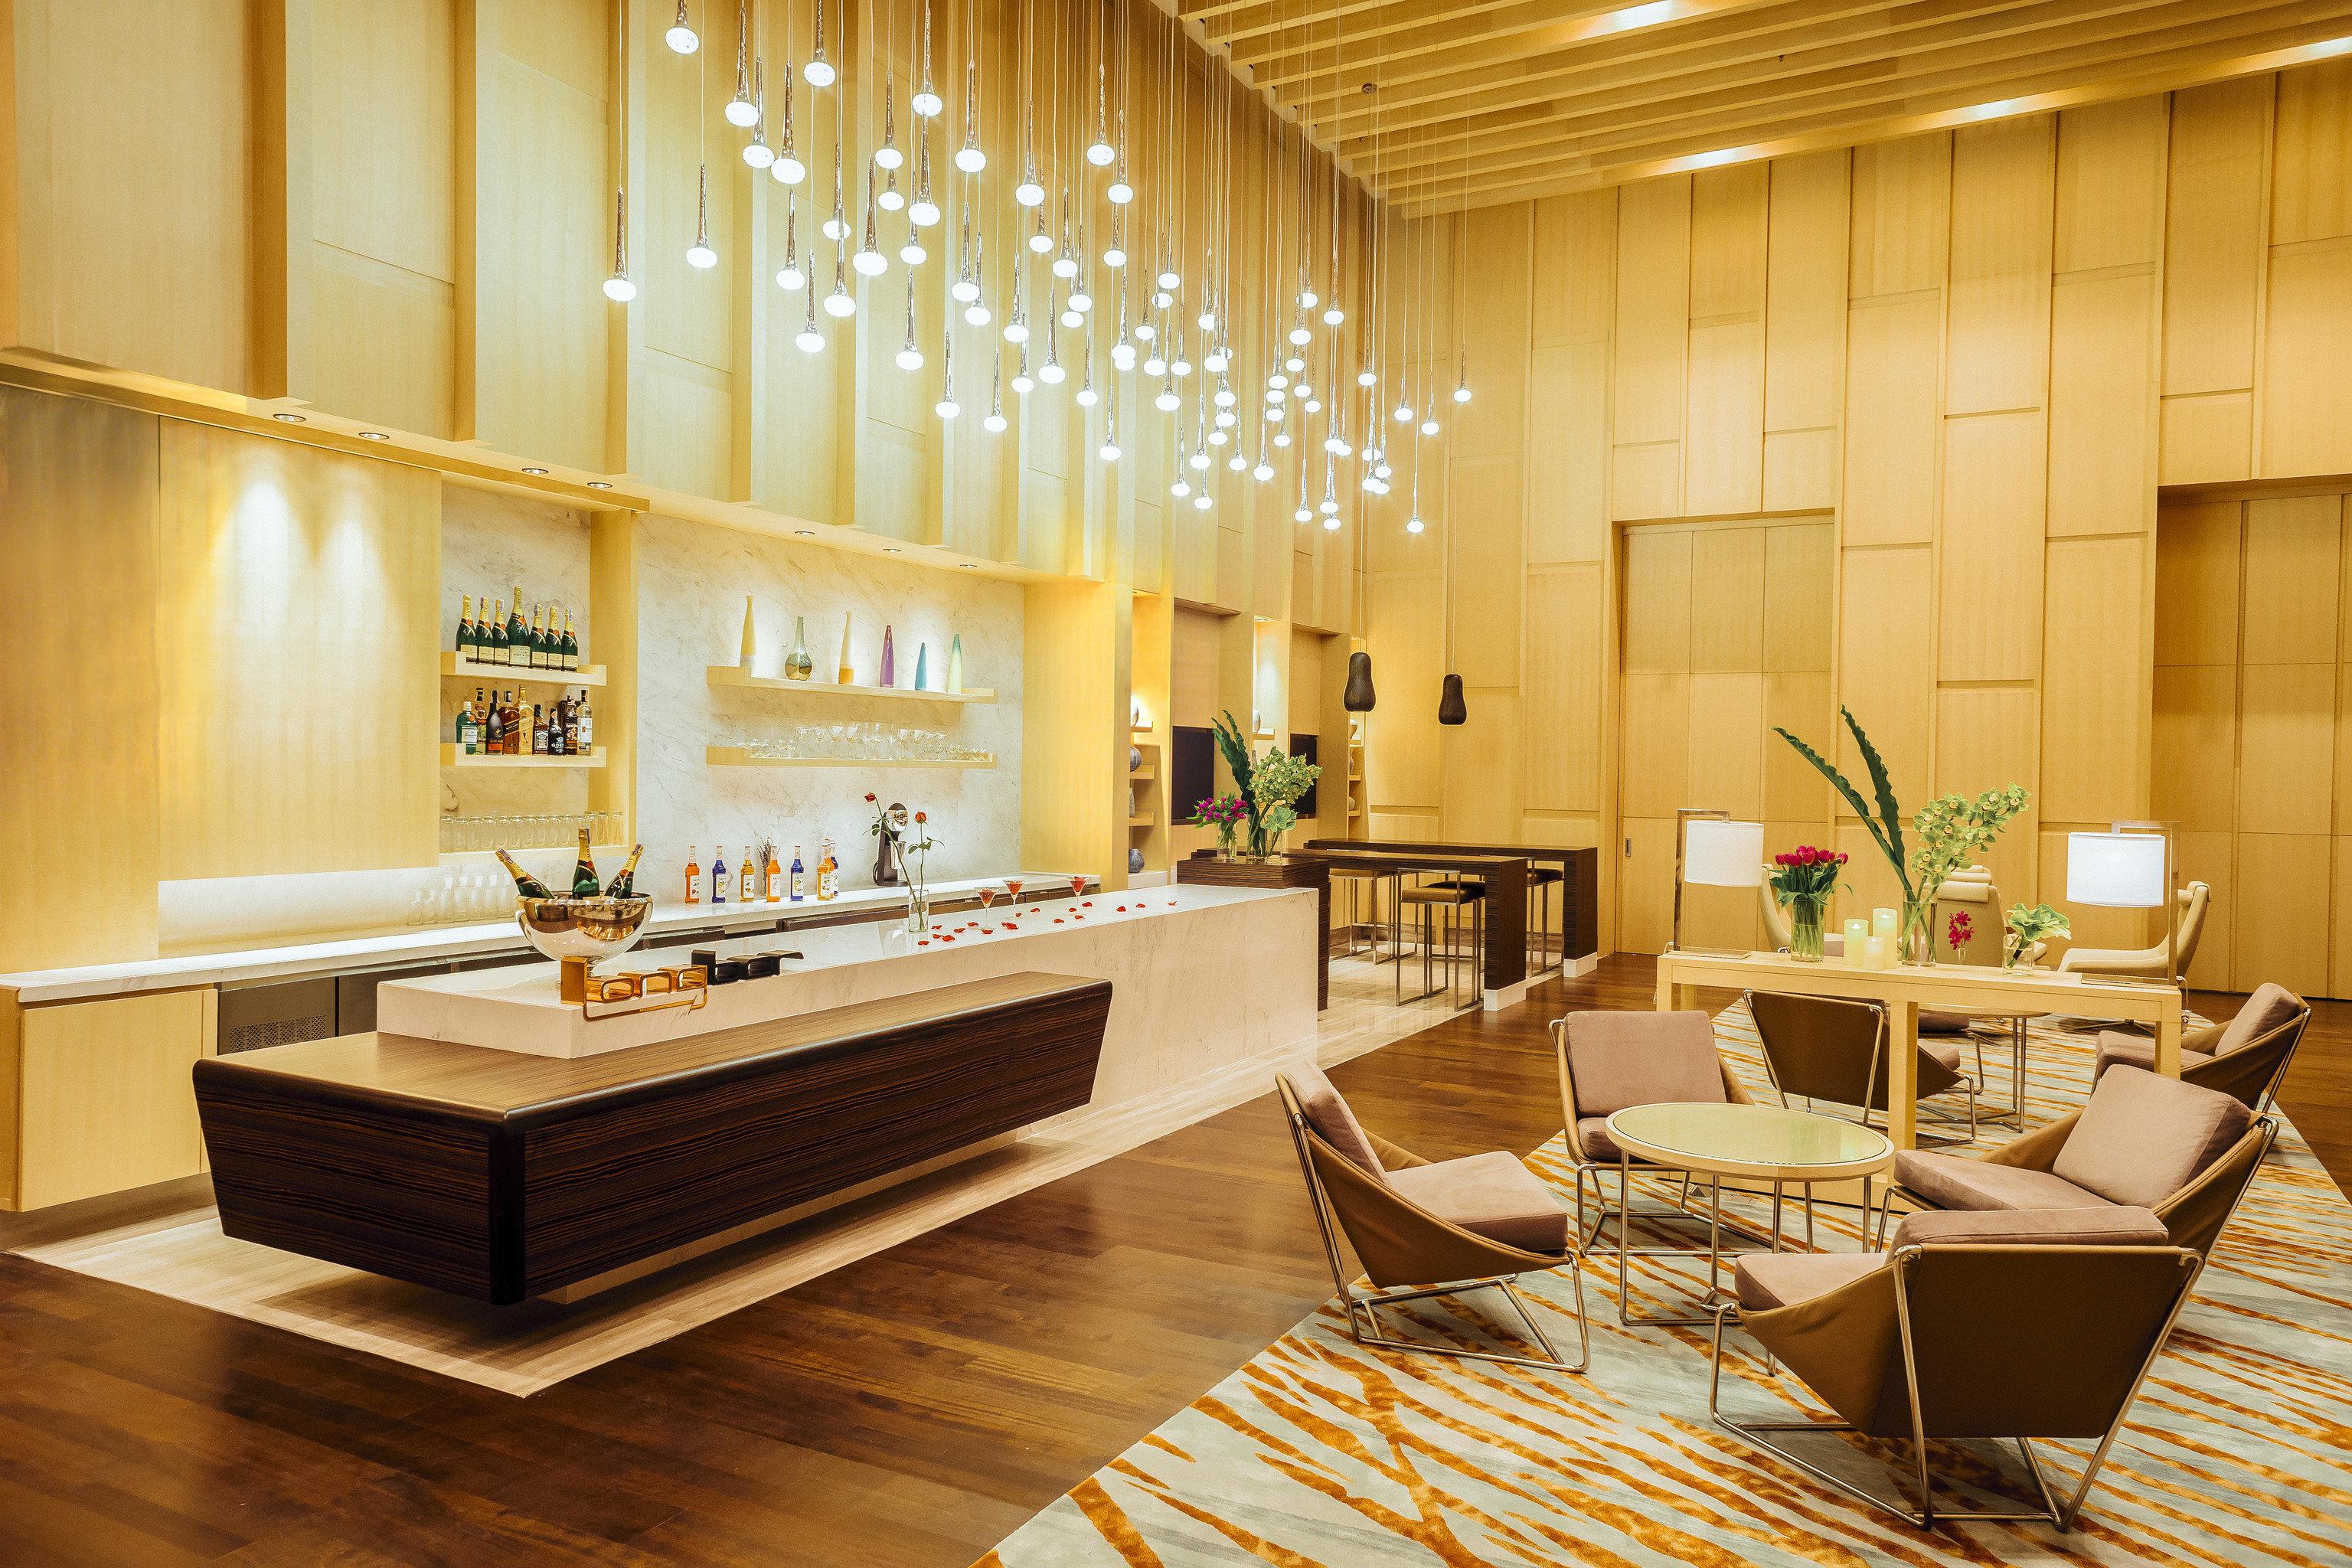 Hotels Romance indoor table wall floor room property ceiling Lobby interior design estate living room home Design restaurant furniture